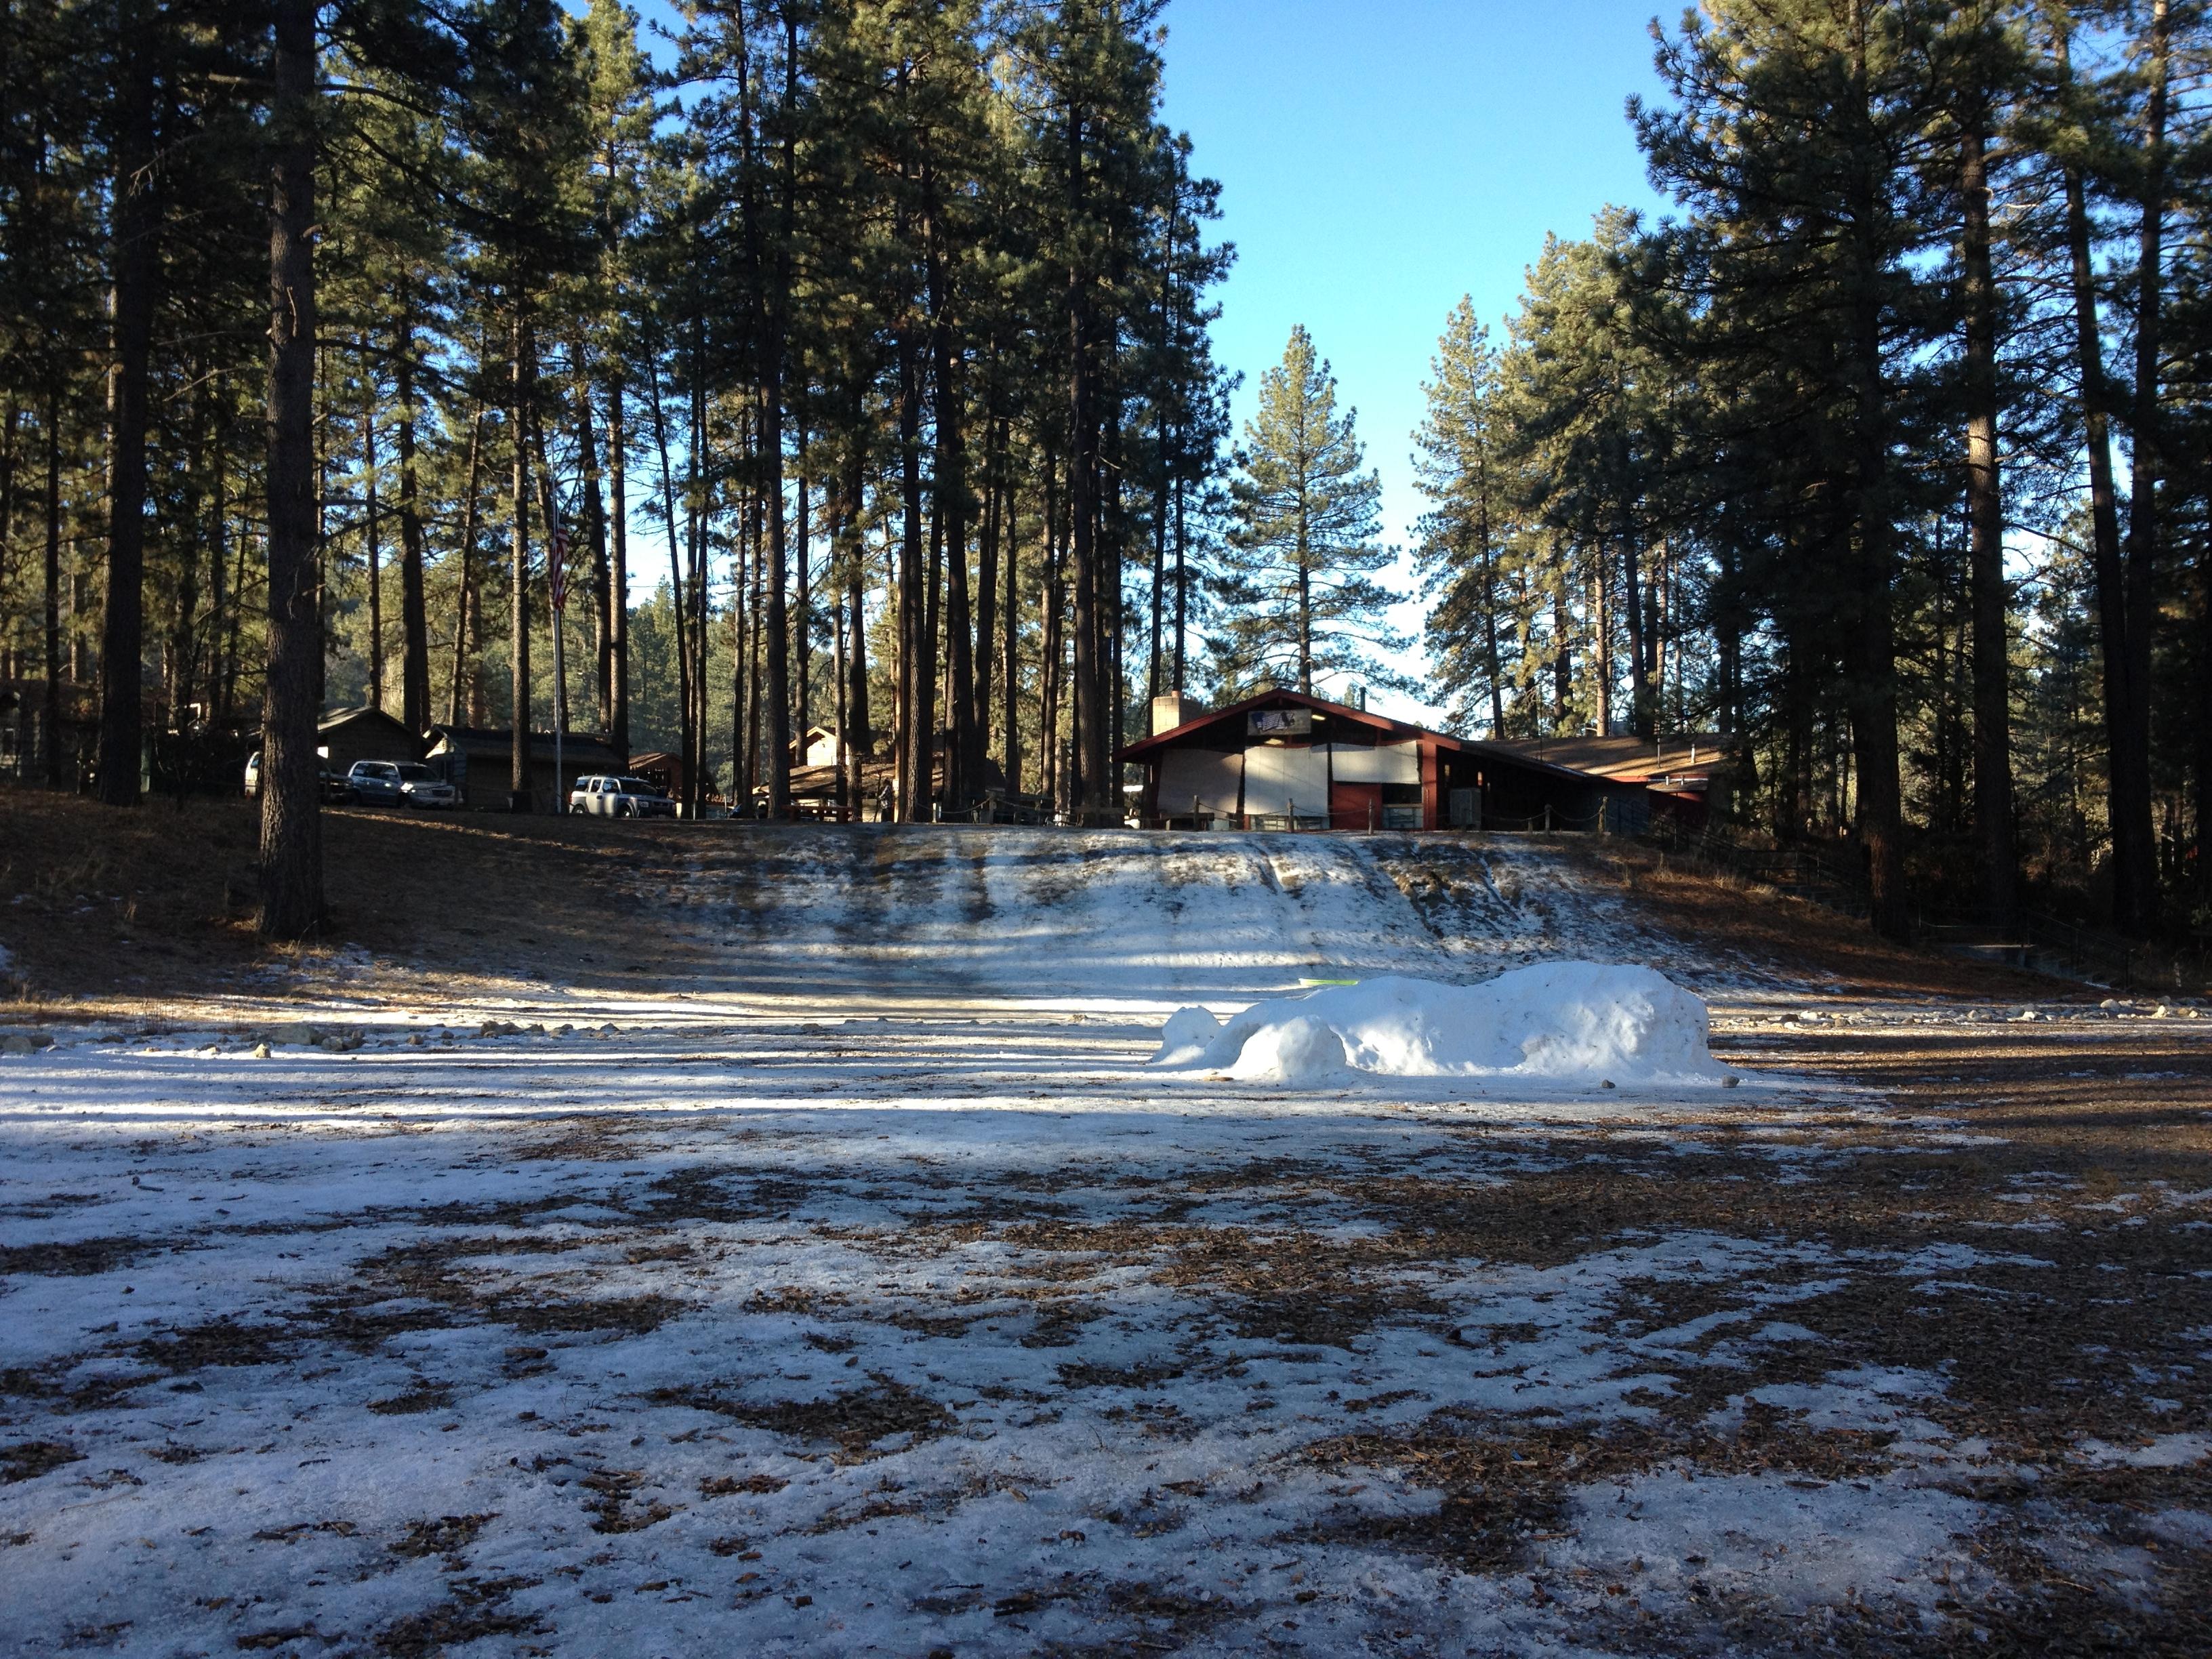 Snow Camp - February 2013